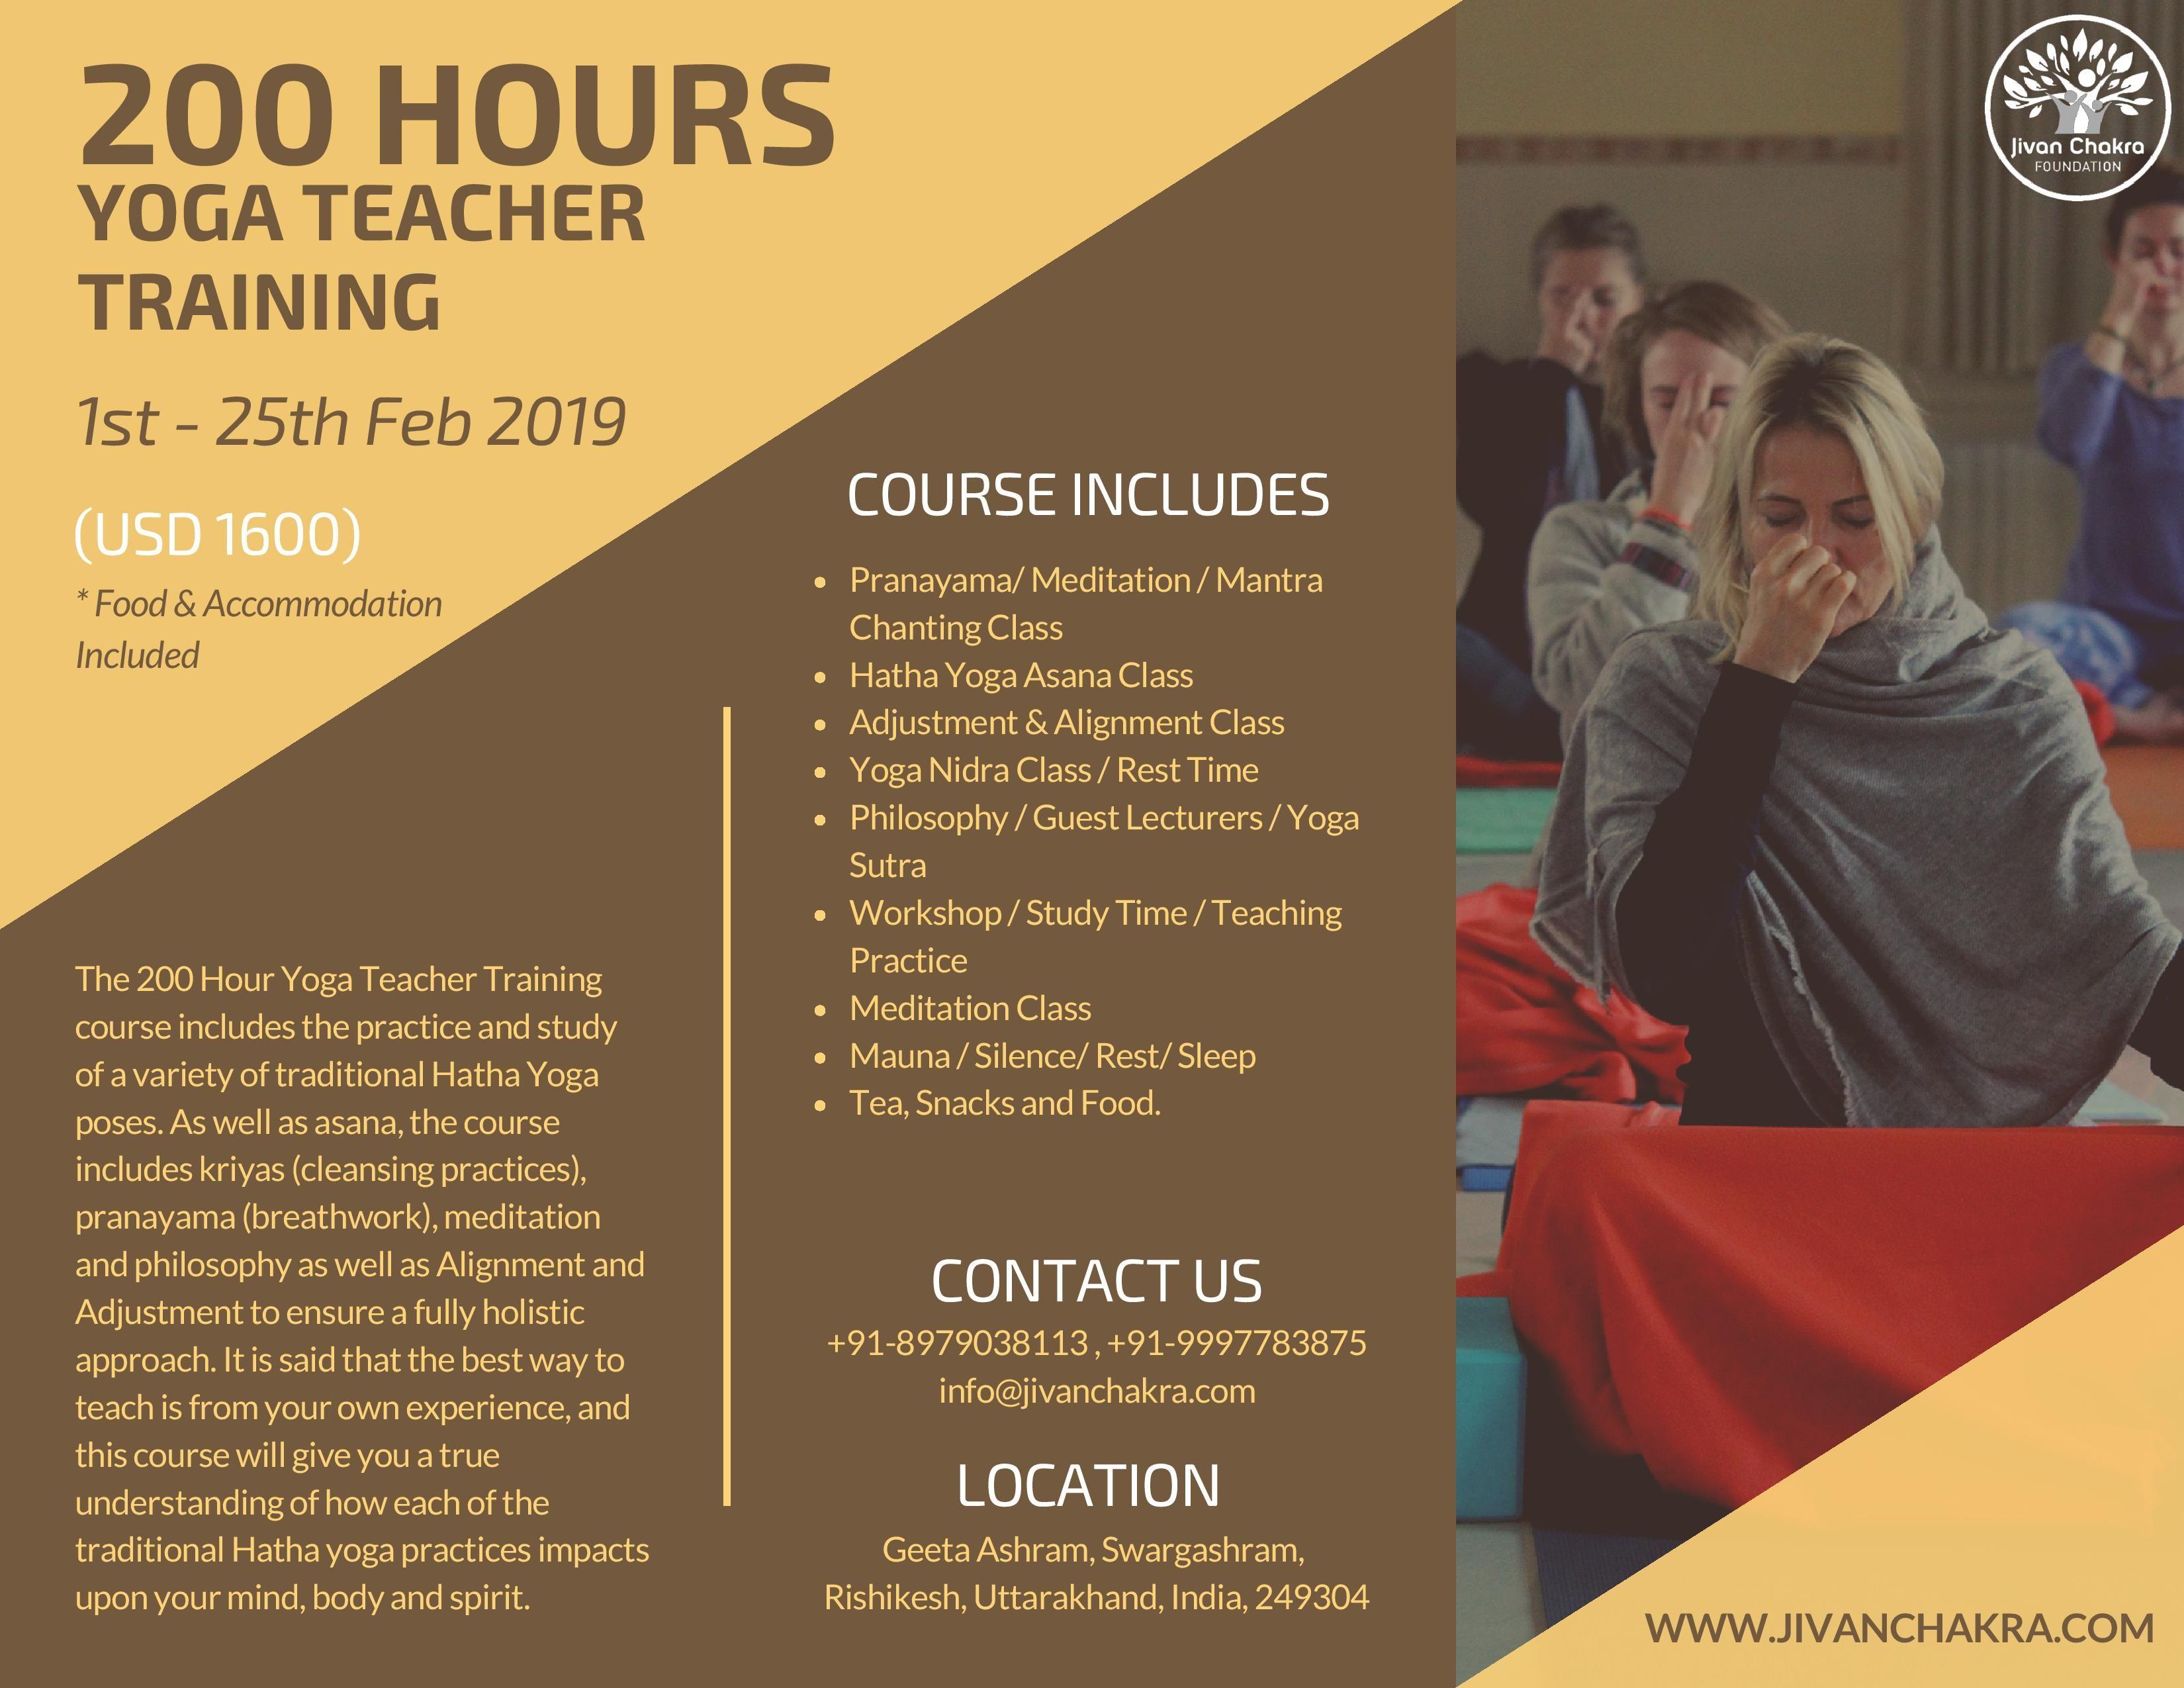 200 Hour Yoga Teacher Training Course In India At Jivan Chakra Foundation Ris 200 Hour Yoga Teacher Training Yoga Teacher Training Hatha Yoga Teacher Training